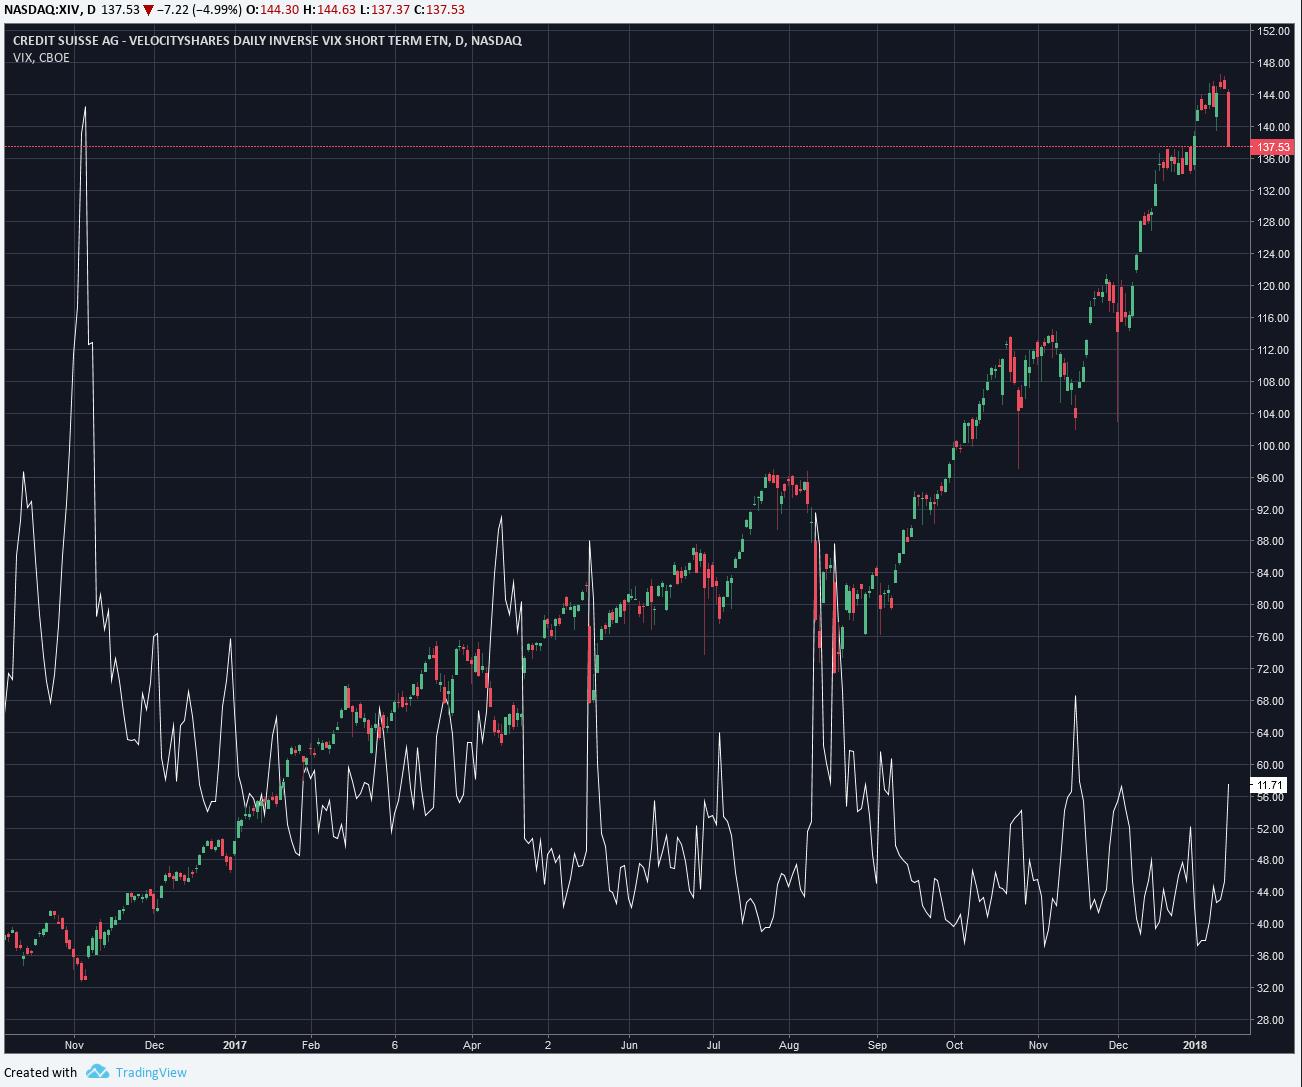 XIV Volatility